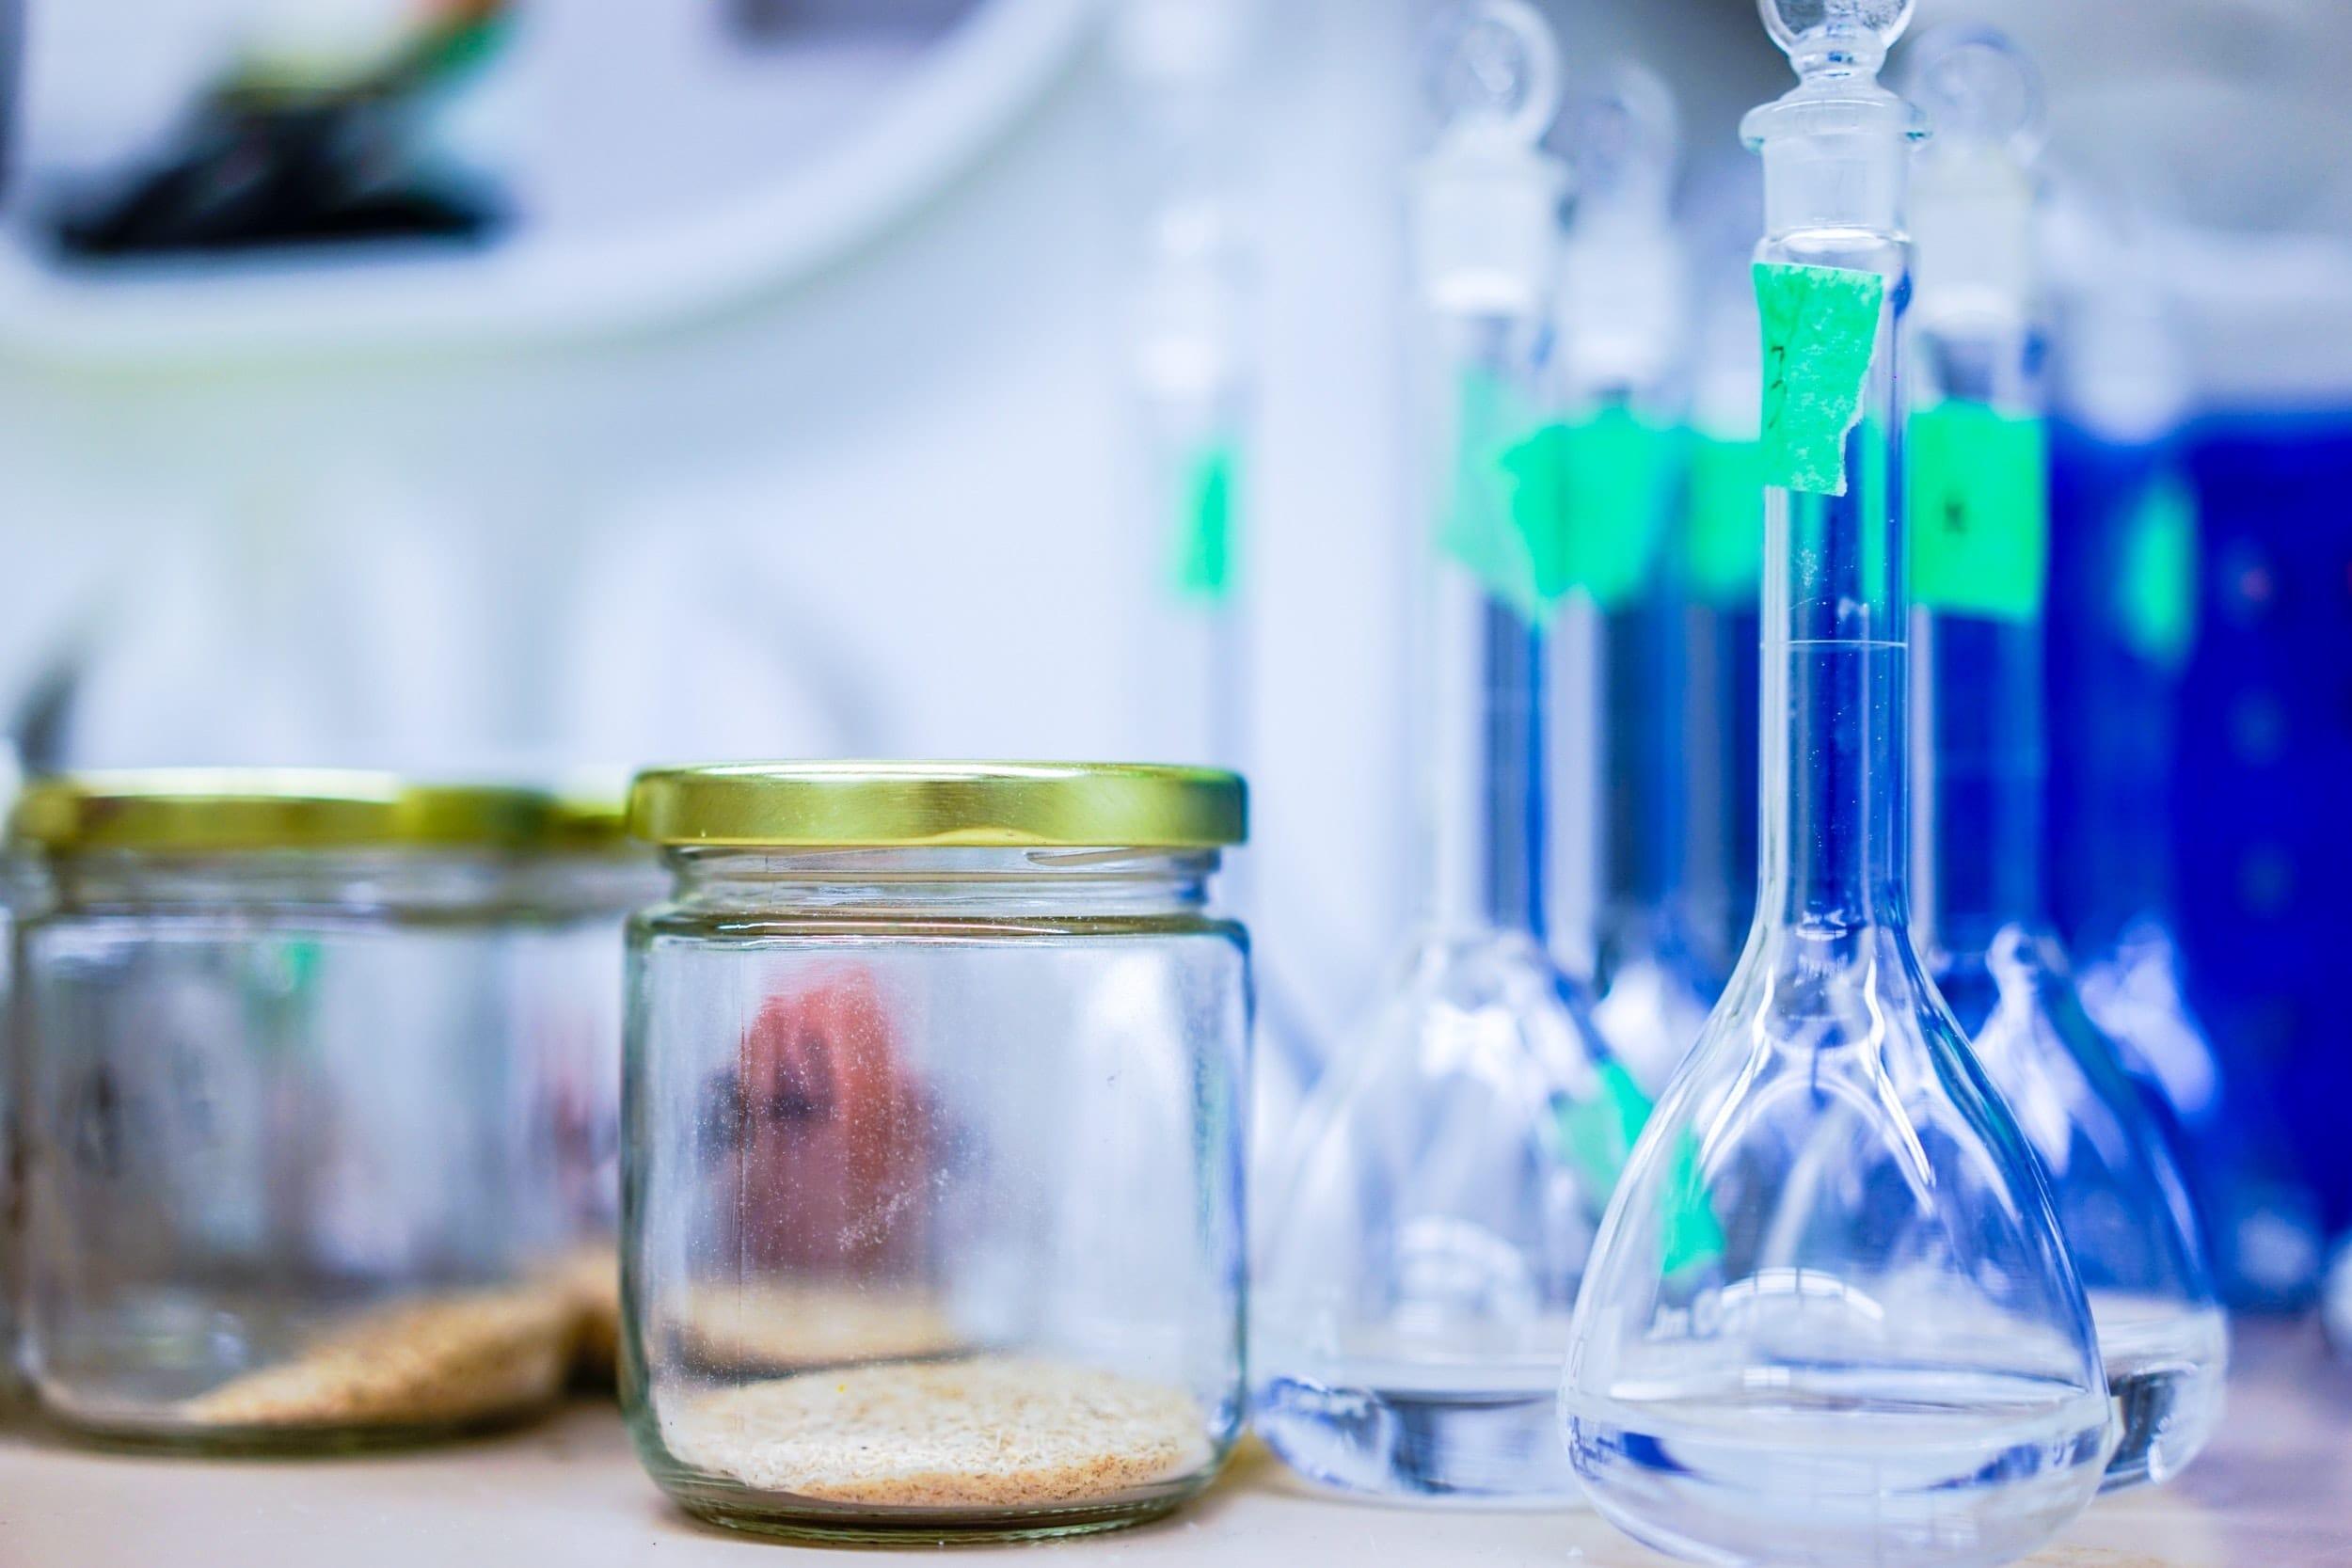 bleaching qualities of hydrogen peroxide